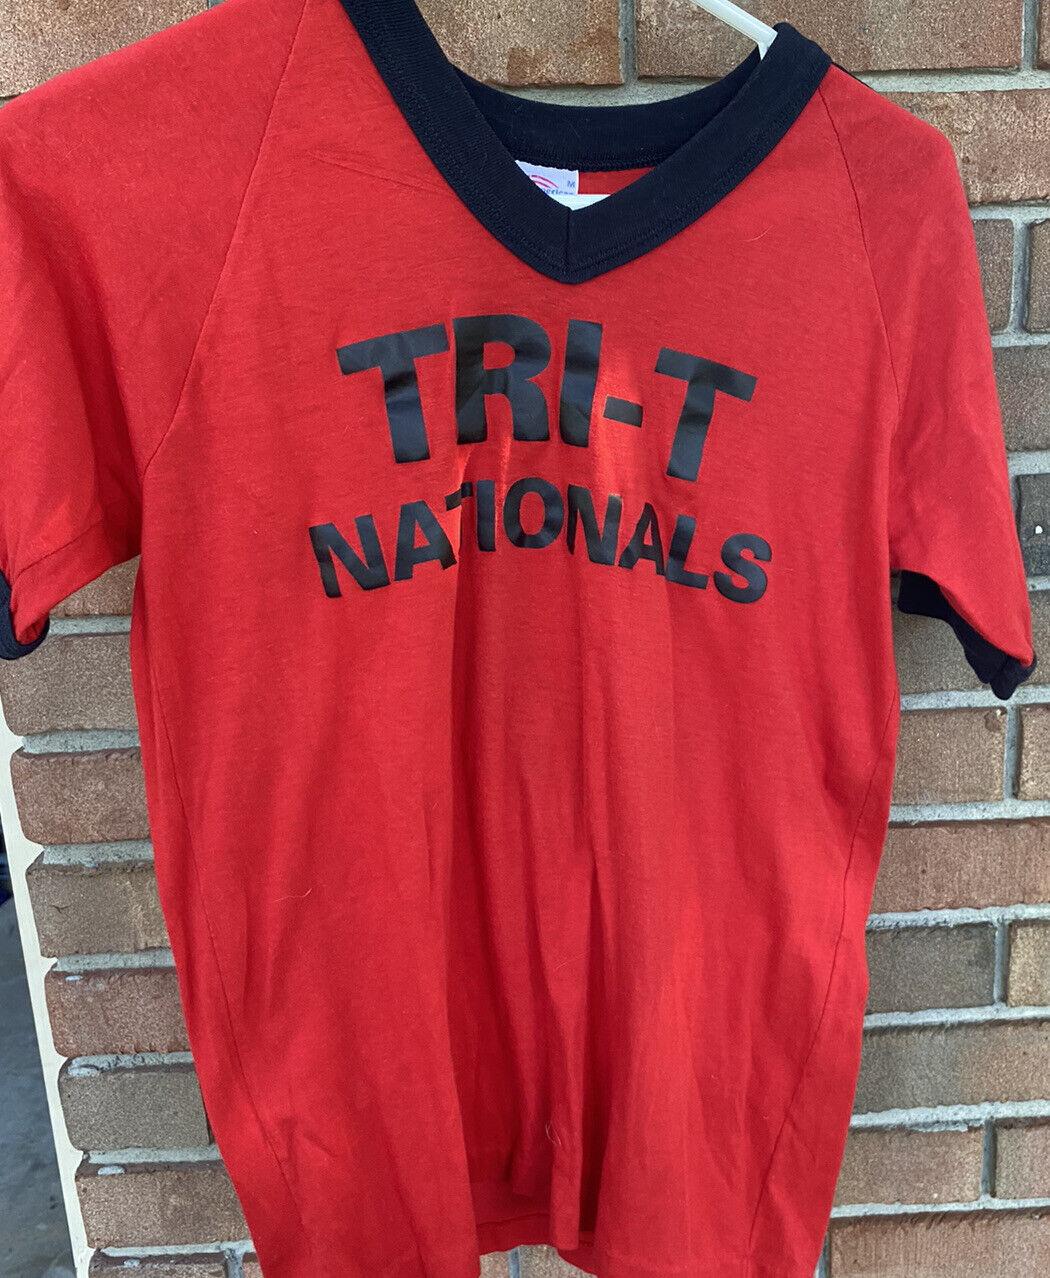 Vintage Pony Baseball Tournament Team T Shirt TRI T Nationals Number 7